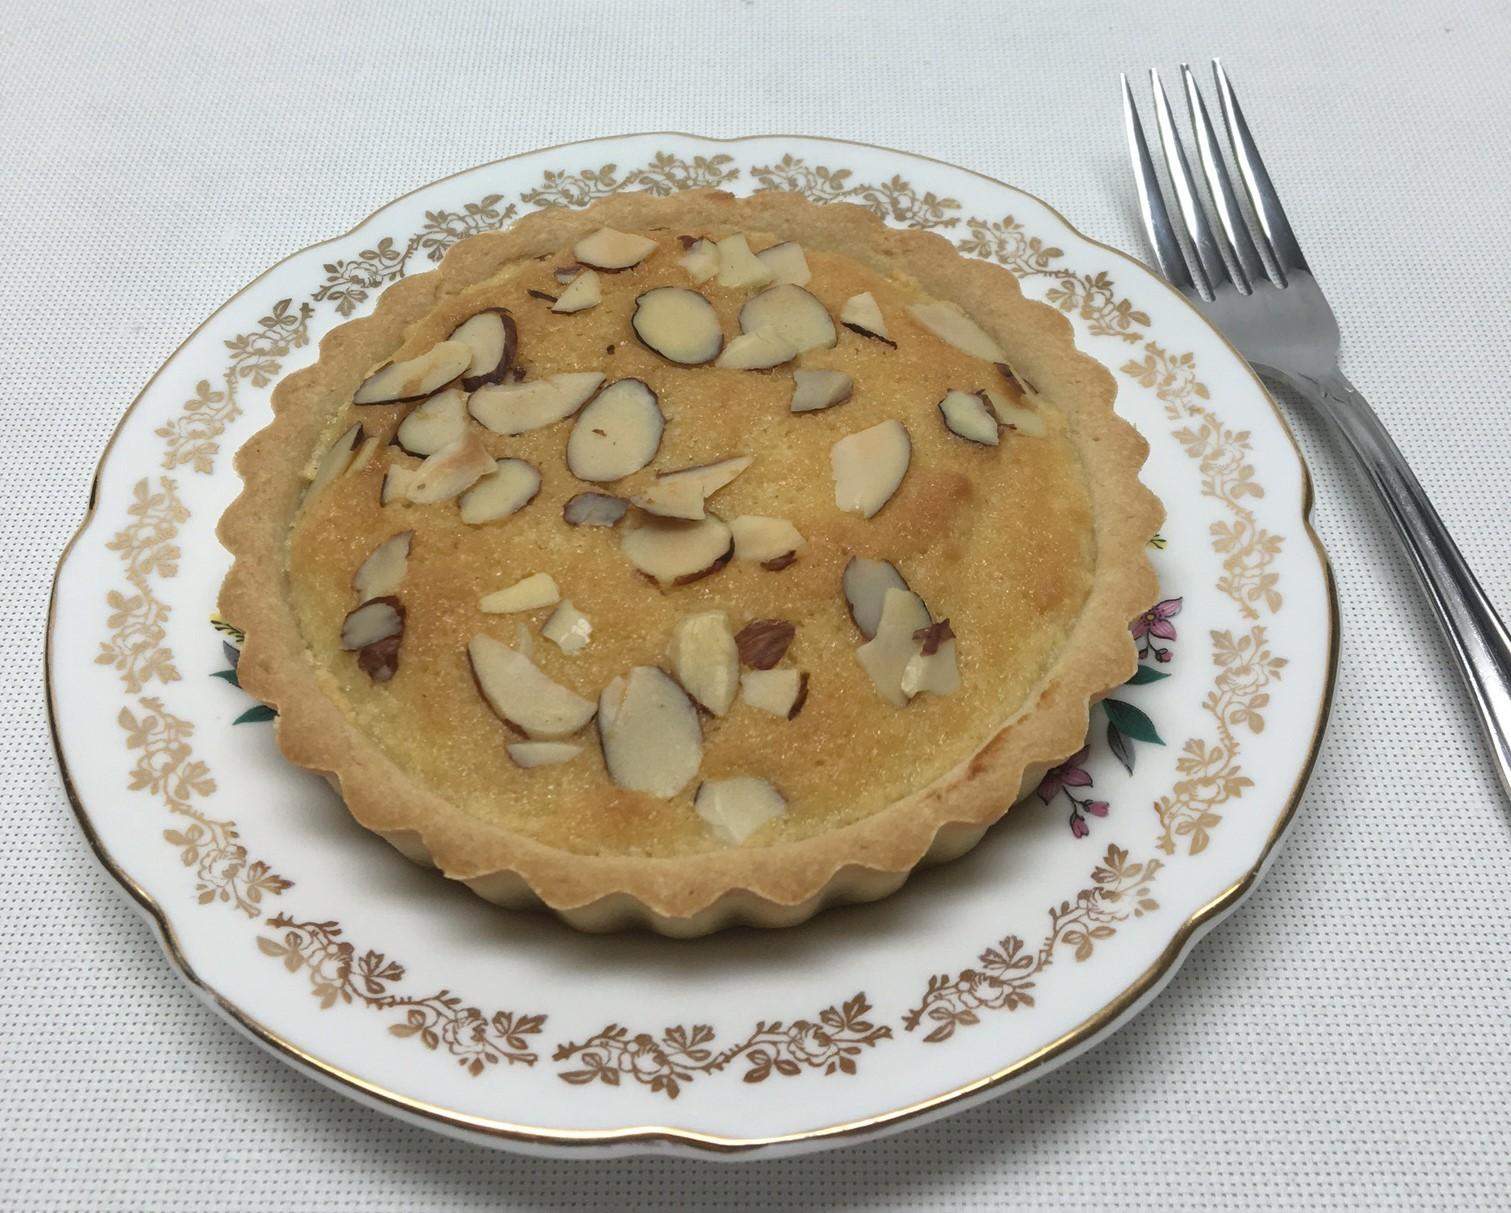 Bakewell tart mini